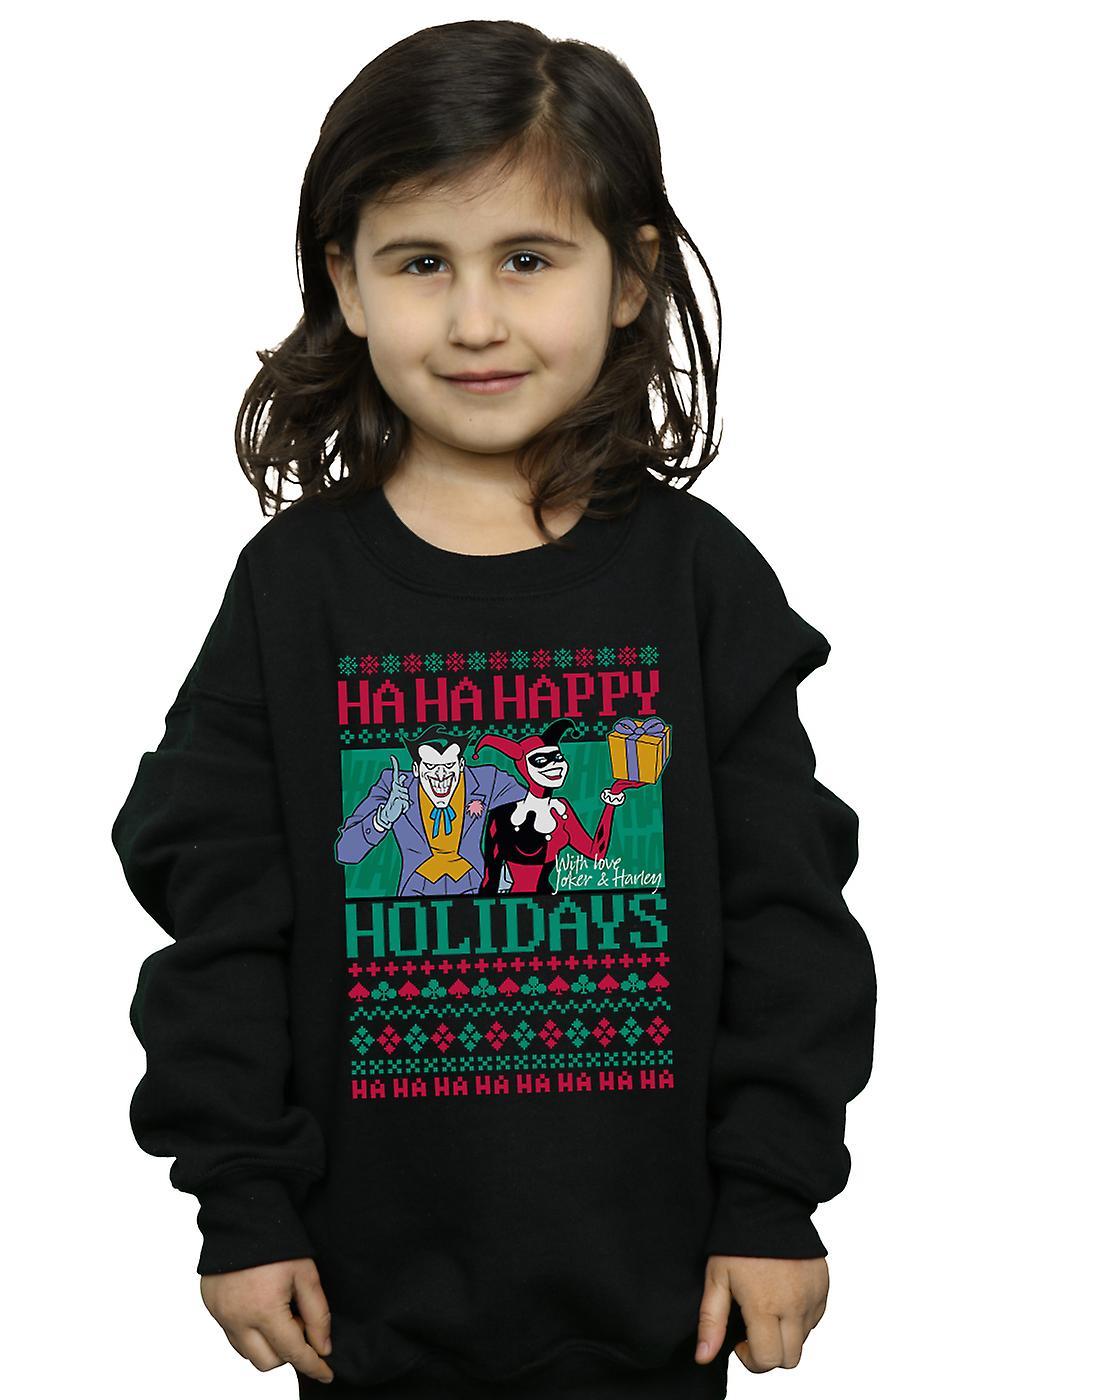 DC Comics Girls Joker And Harley Quinn Ha Ha Happy Holidays Sweatshirt